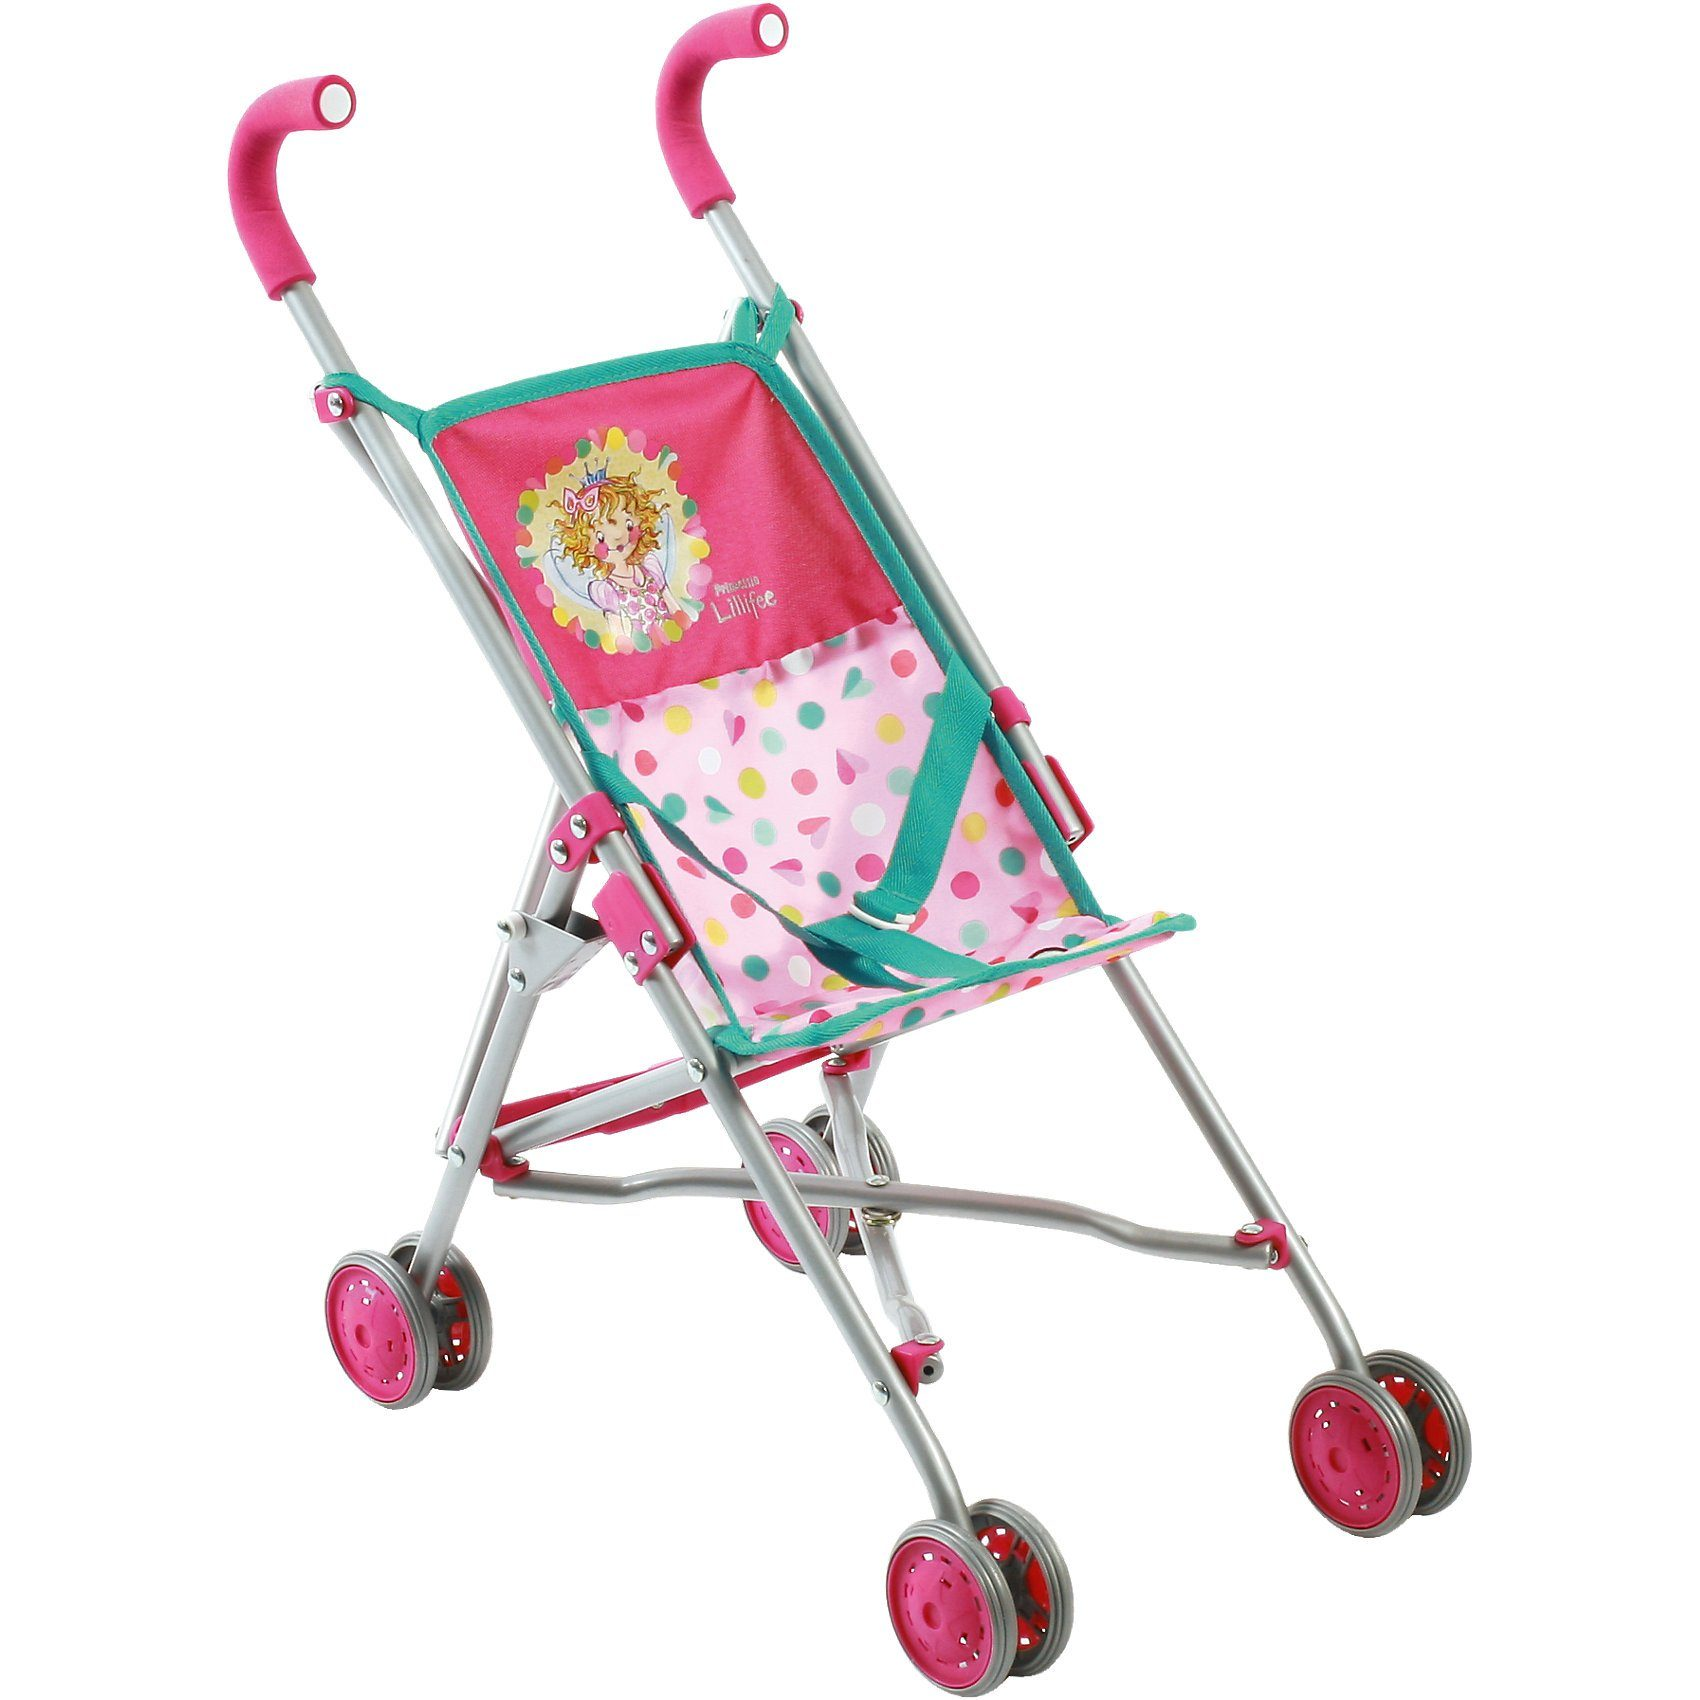 CHIC 2000 Puppenwagen Buggy Prinzessin Lillifee